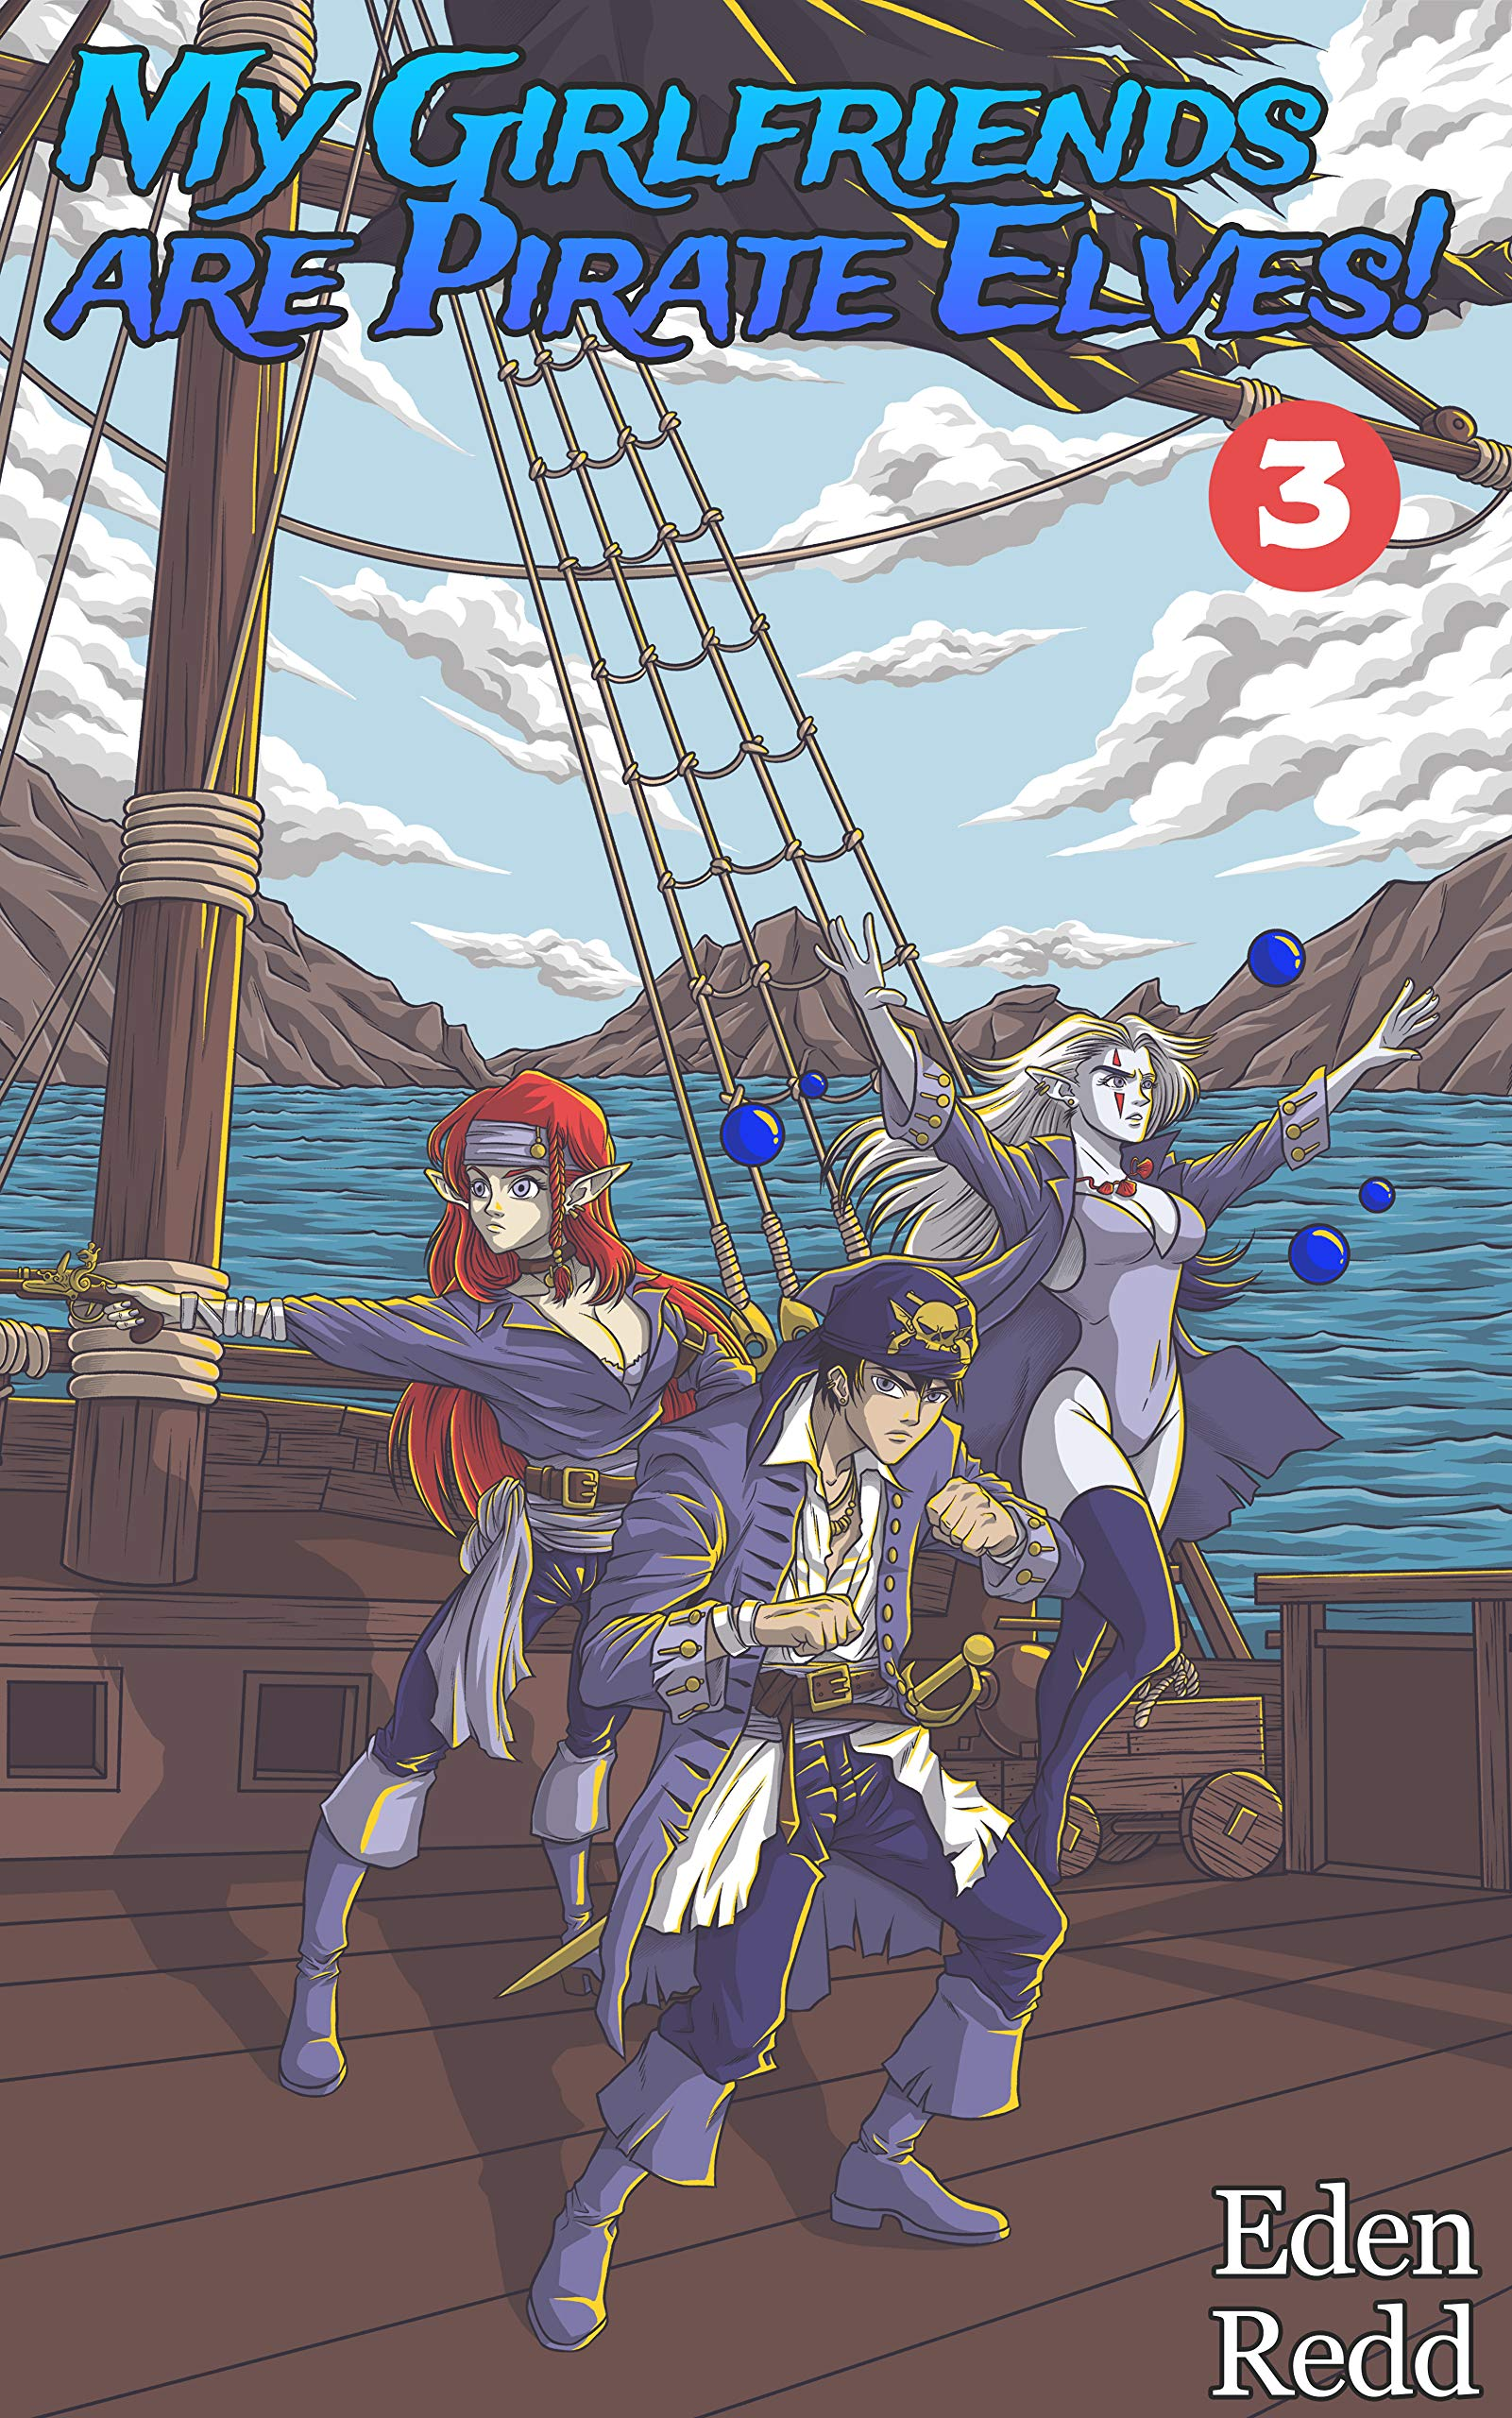 My Girlfriends are Pirate Elves!: Book 3: A Fantasy Light Novel